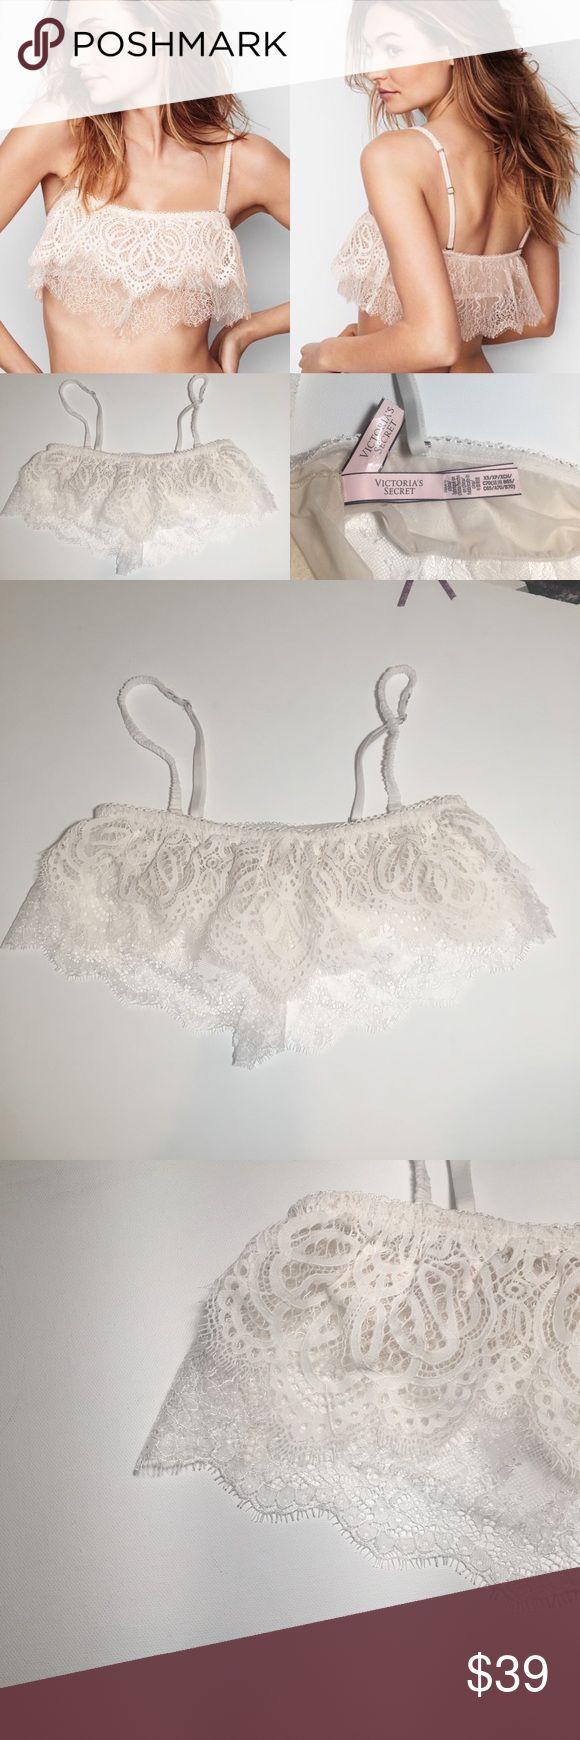 Victoria's Secret lace crochet flutter Bralette B720- NWT Victoria's Secret dream angels  White lace crochet flutter Bralette size xs removable straps . Victoria's Secret Intimates & Sleepwear Bras